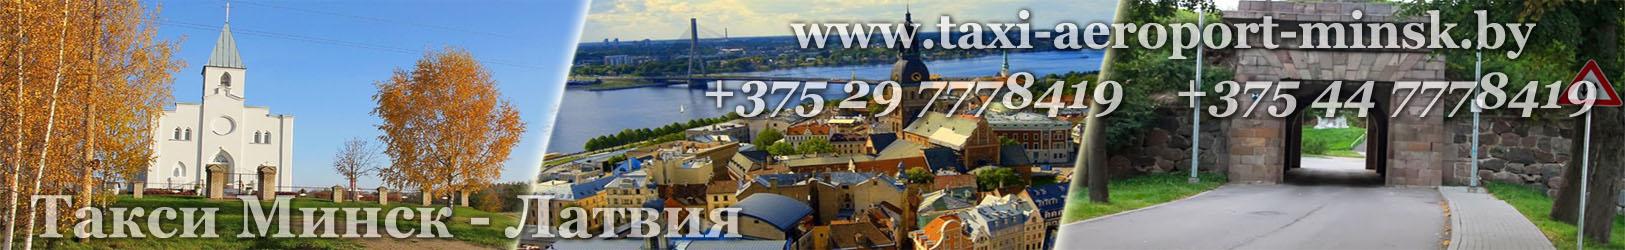 Такси Минск Рига ( Rīga) -Даугавпилс (Daugavpils ) - Demene